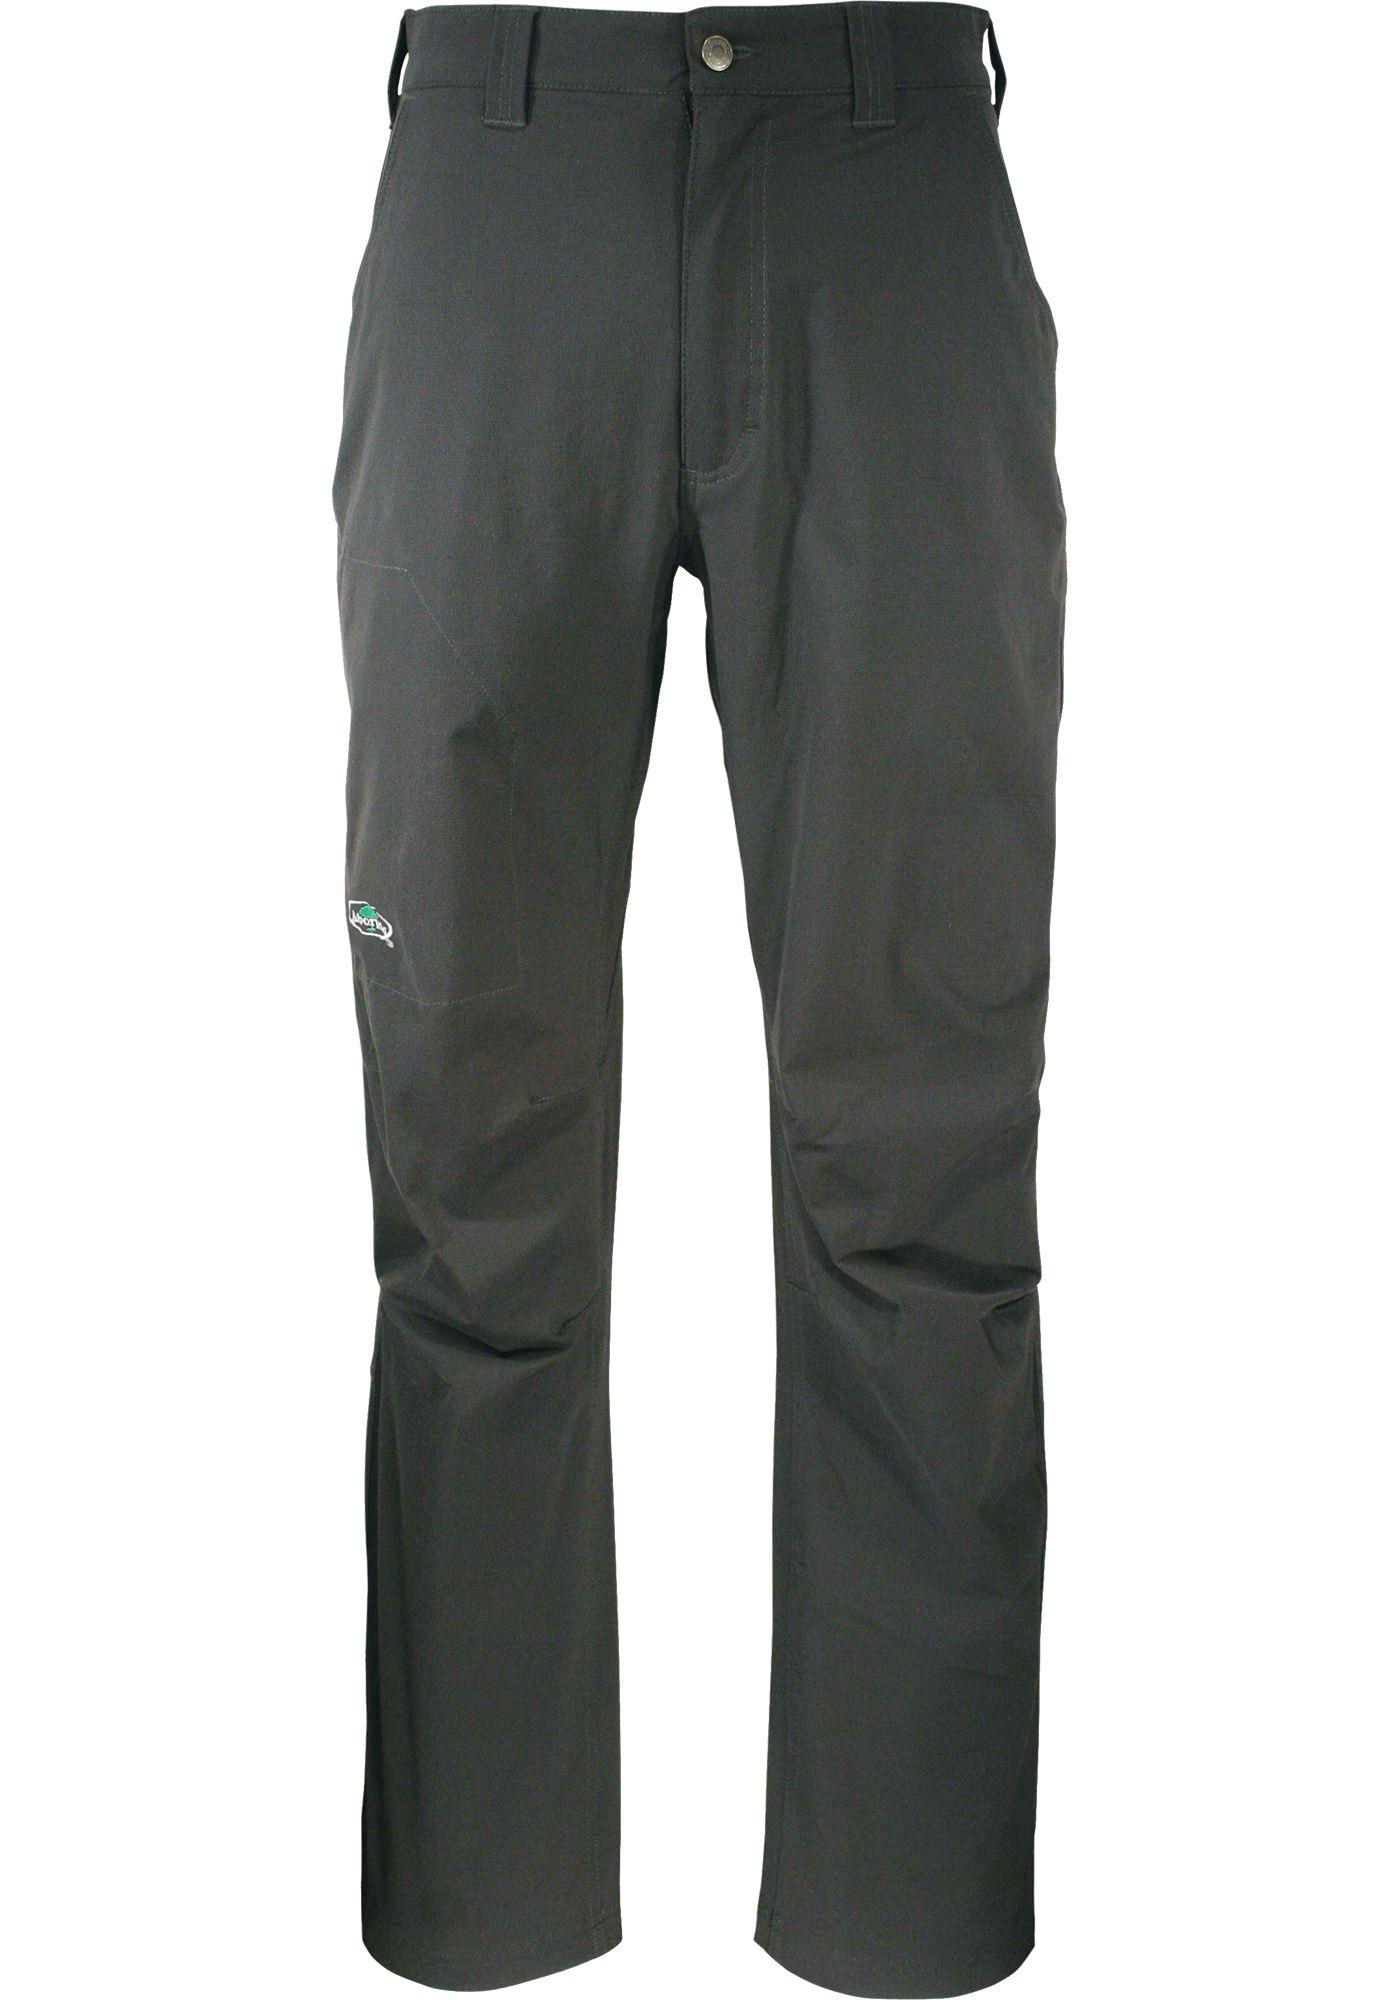 Arborwear Men's Canopy Pants